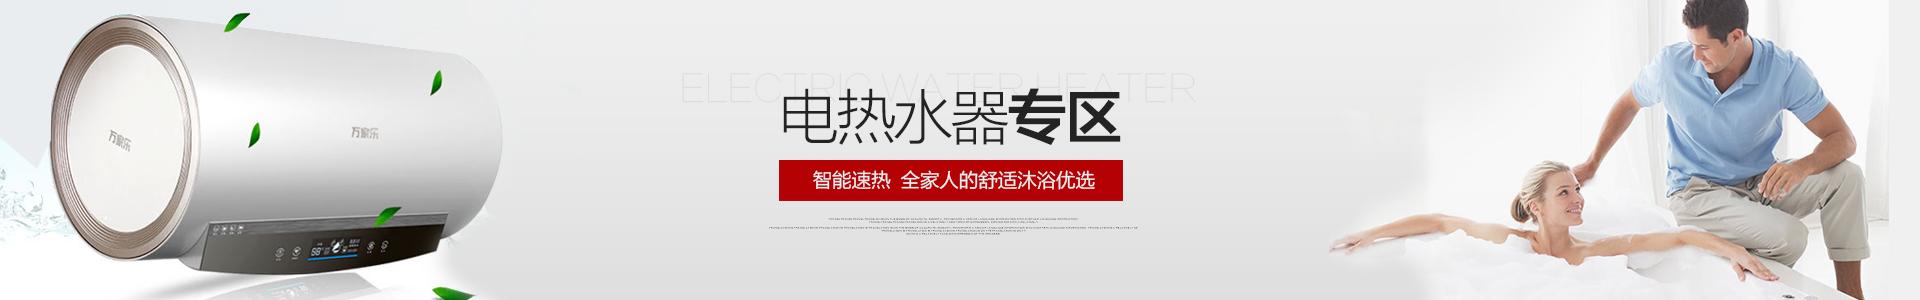 电热水器专区banner.jpg